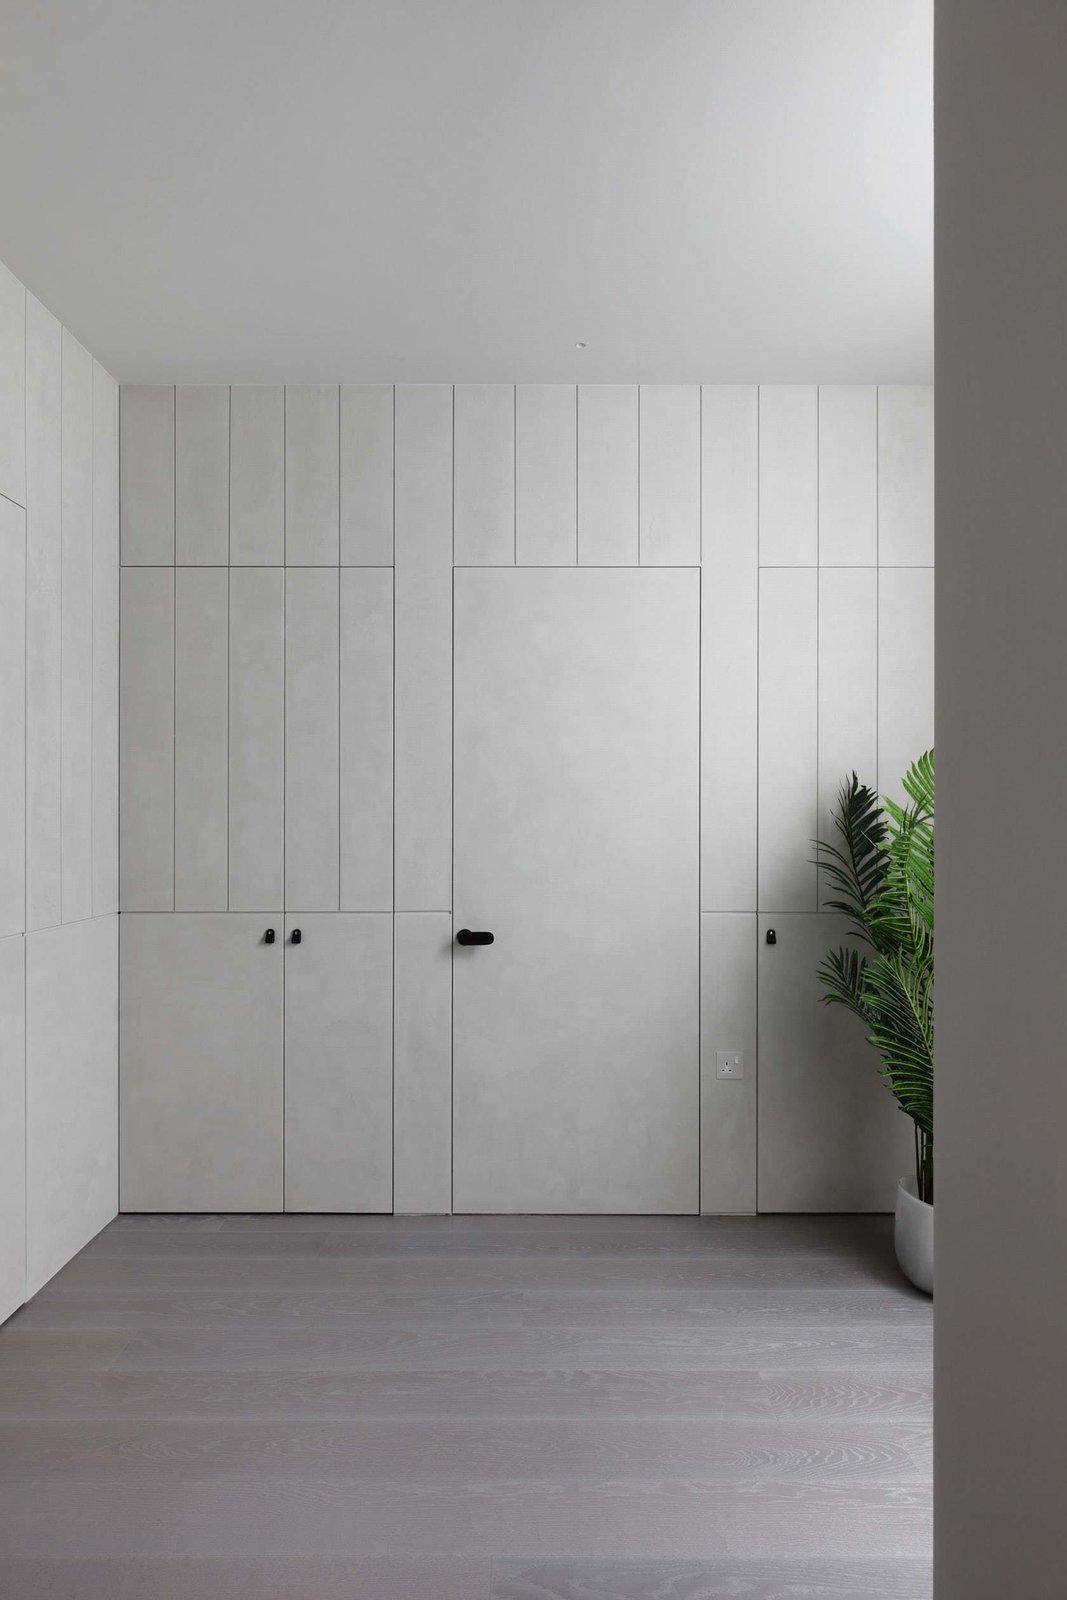 Maida Vale Apartment by Leibal